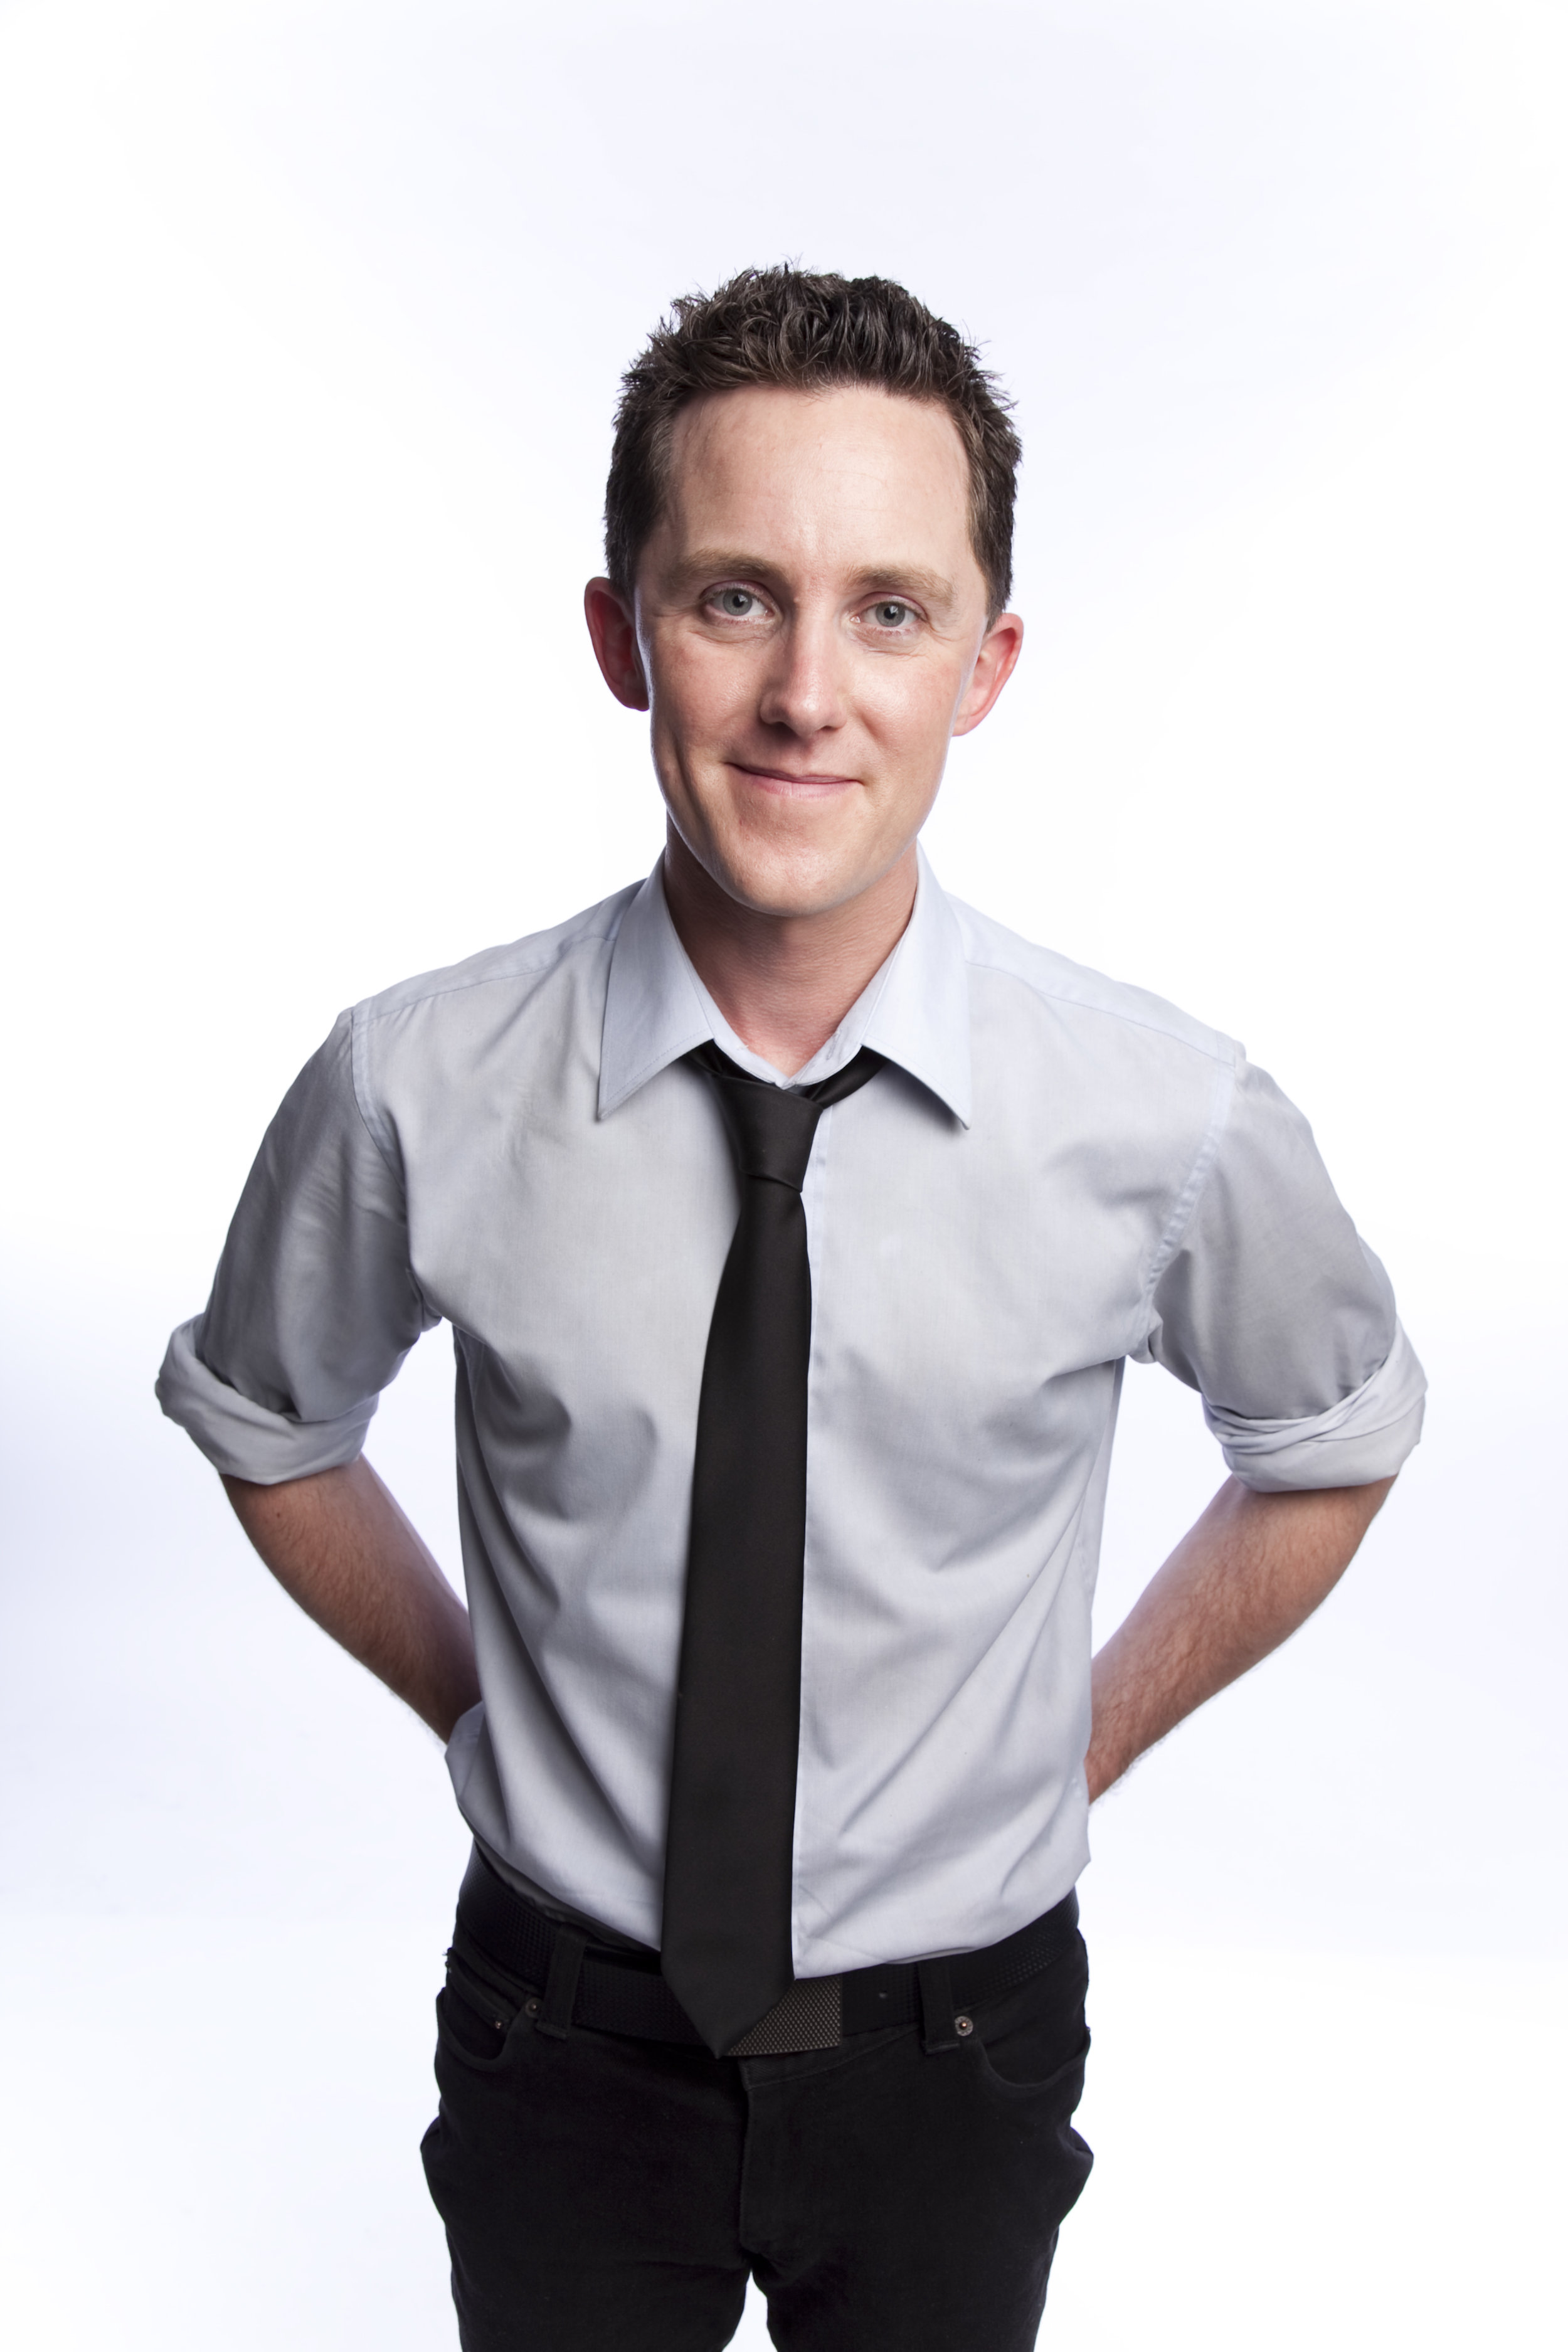 Michael Chamberlin